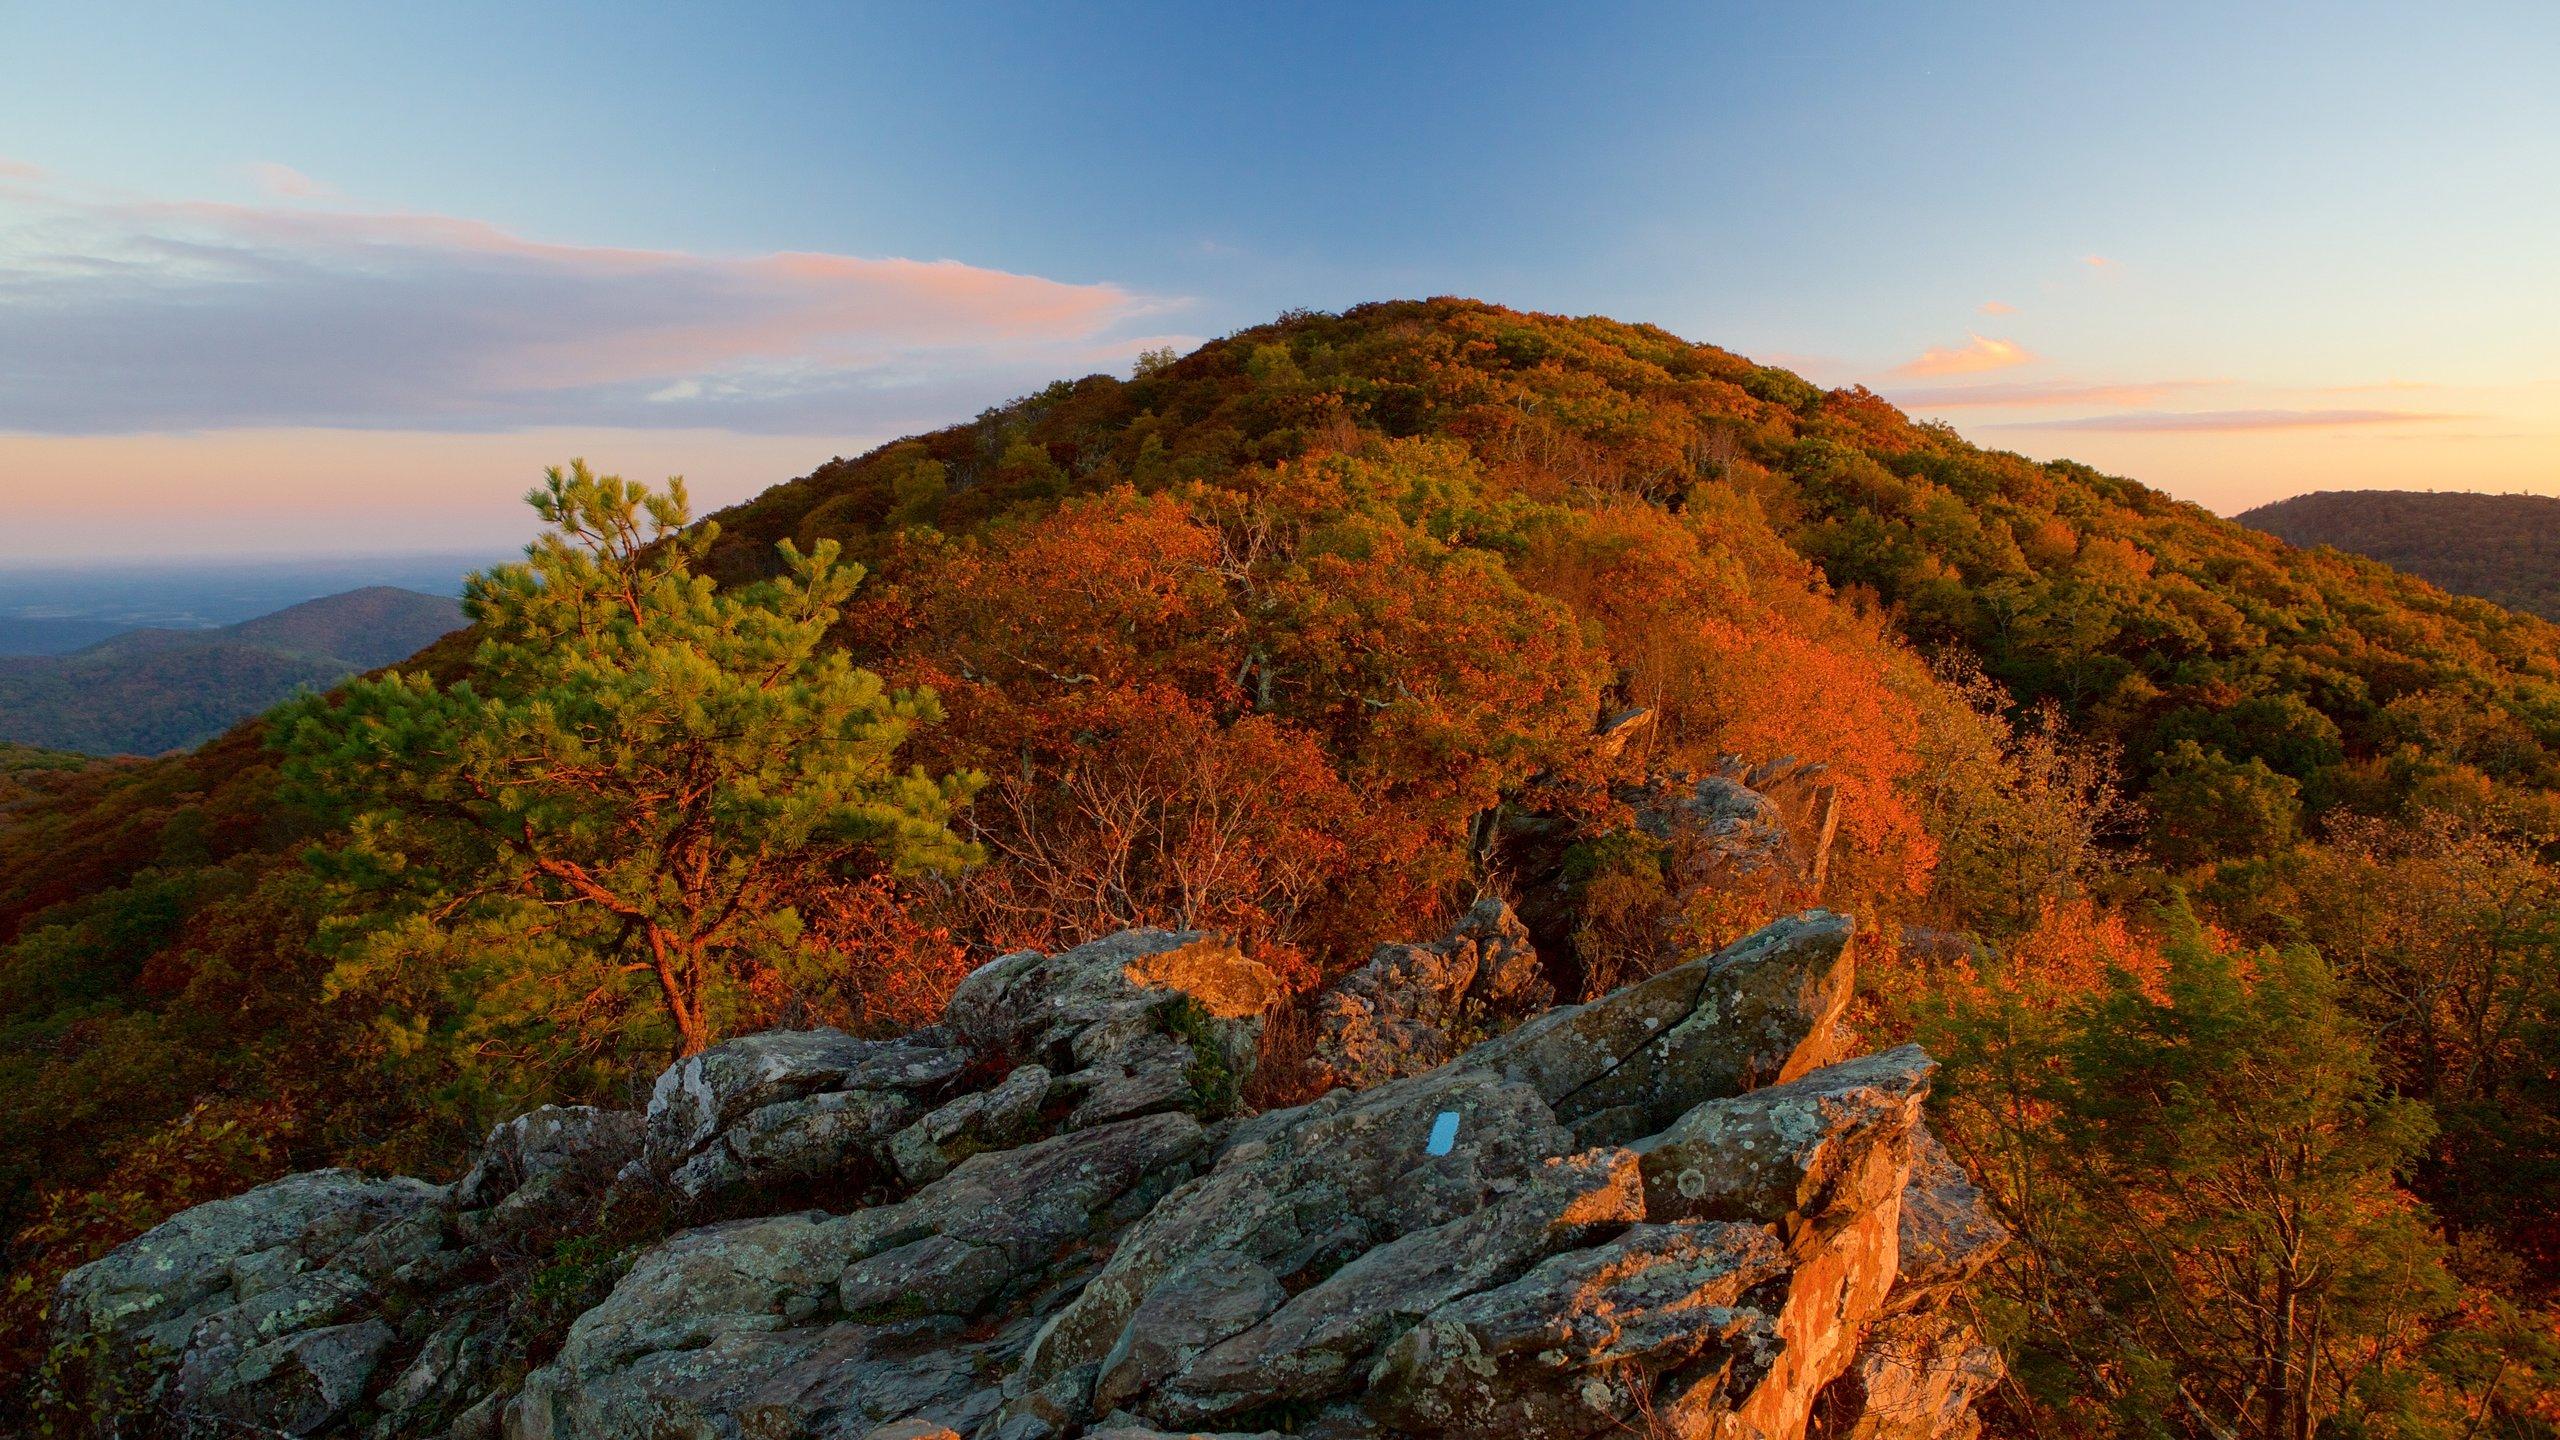 Kunjungi Blue Ridge Mountains: Terbaik di Blue Ridge Mountains, Travel Amerika Serikat 2021 | Expedia Tourism